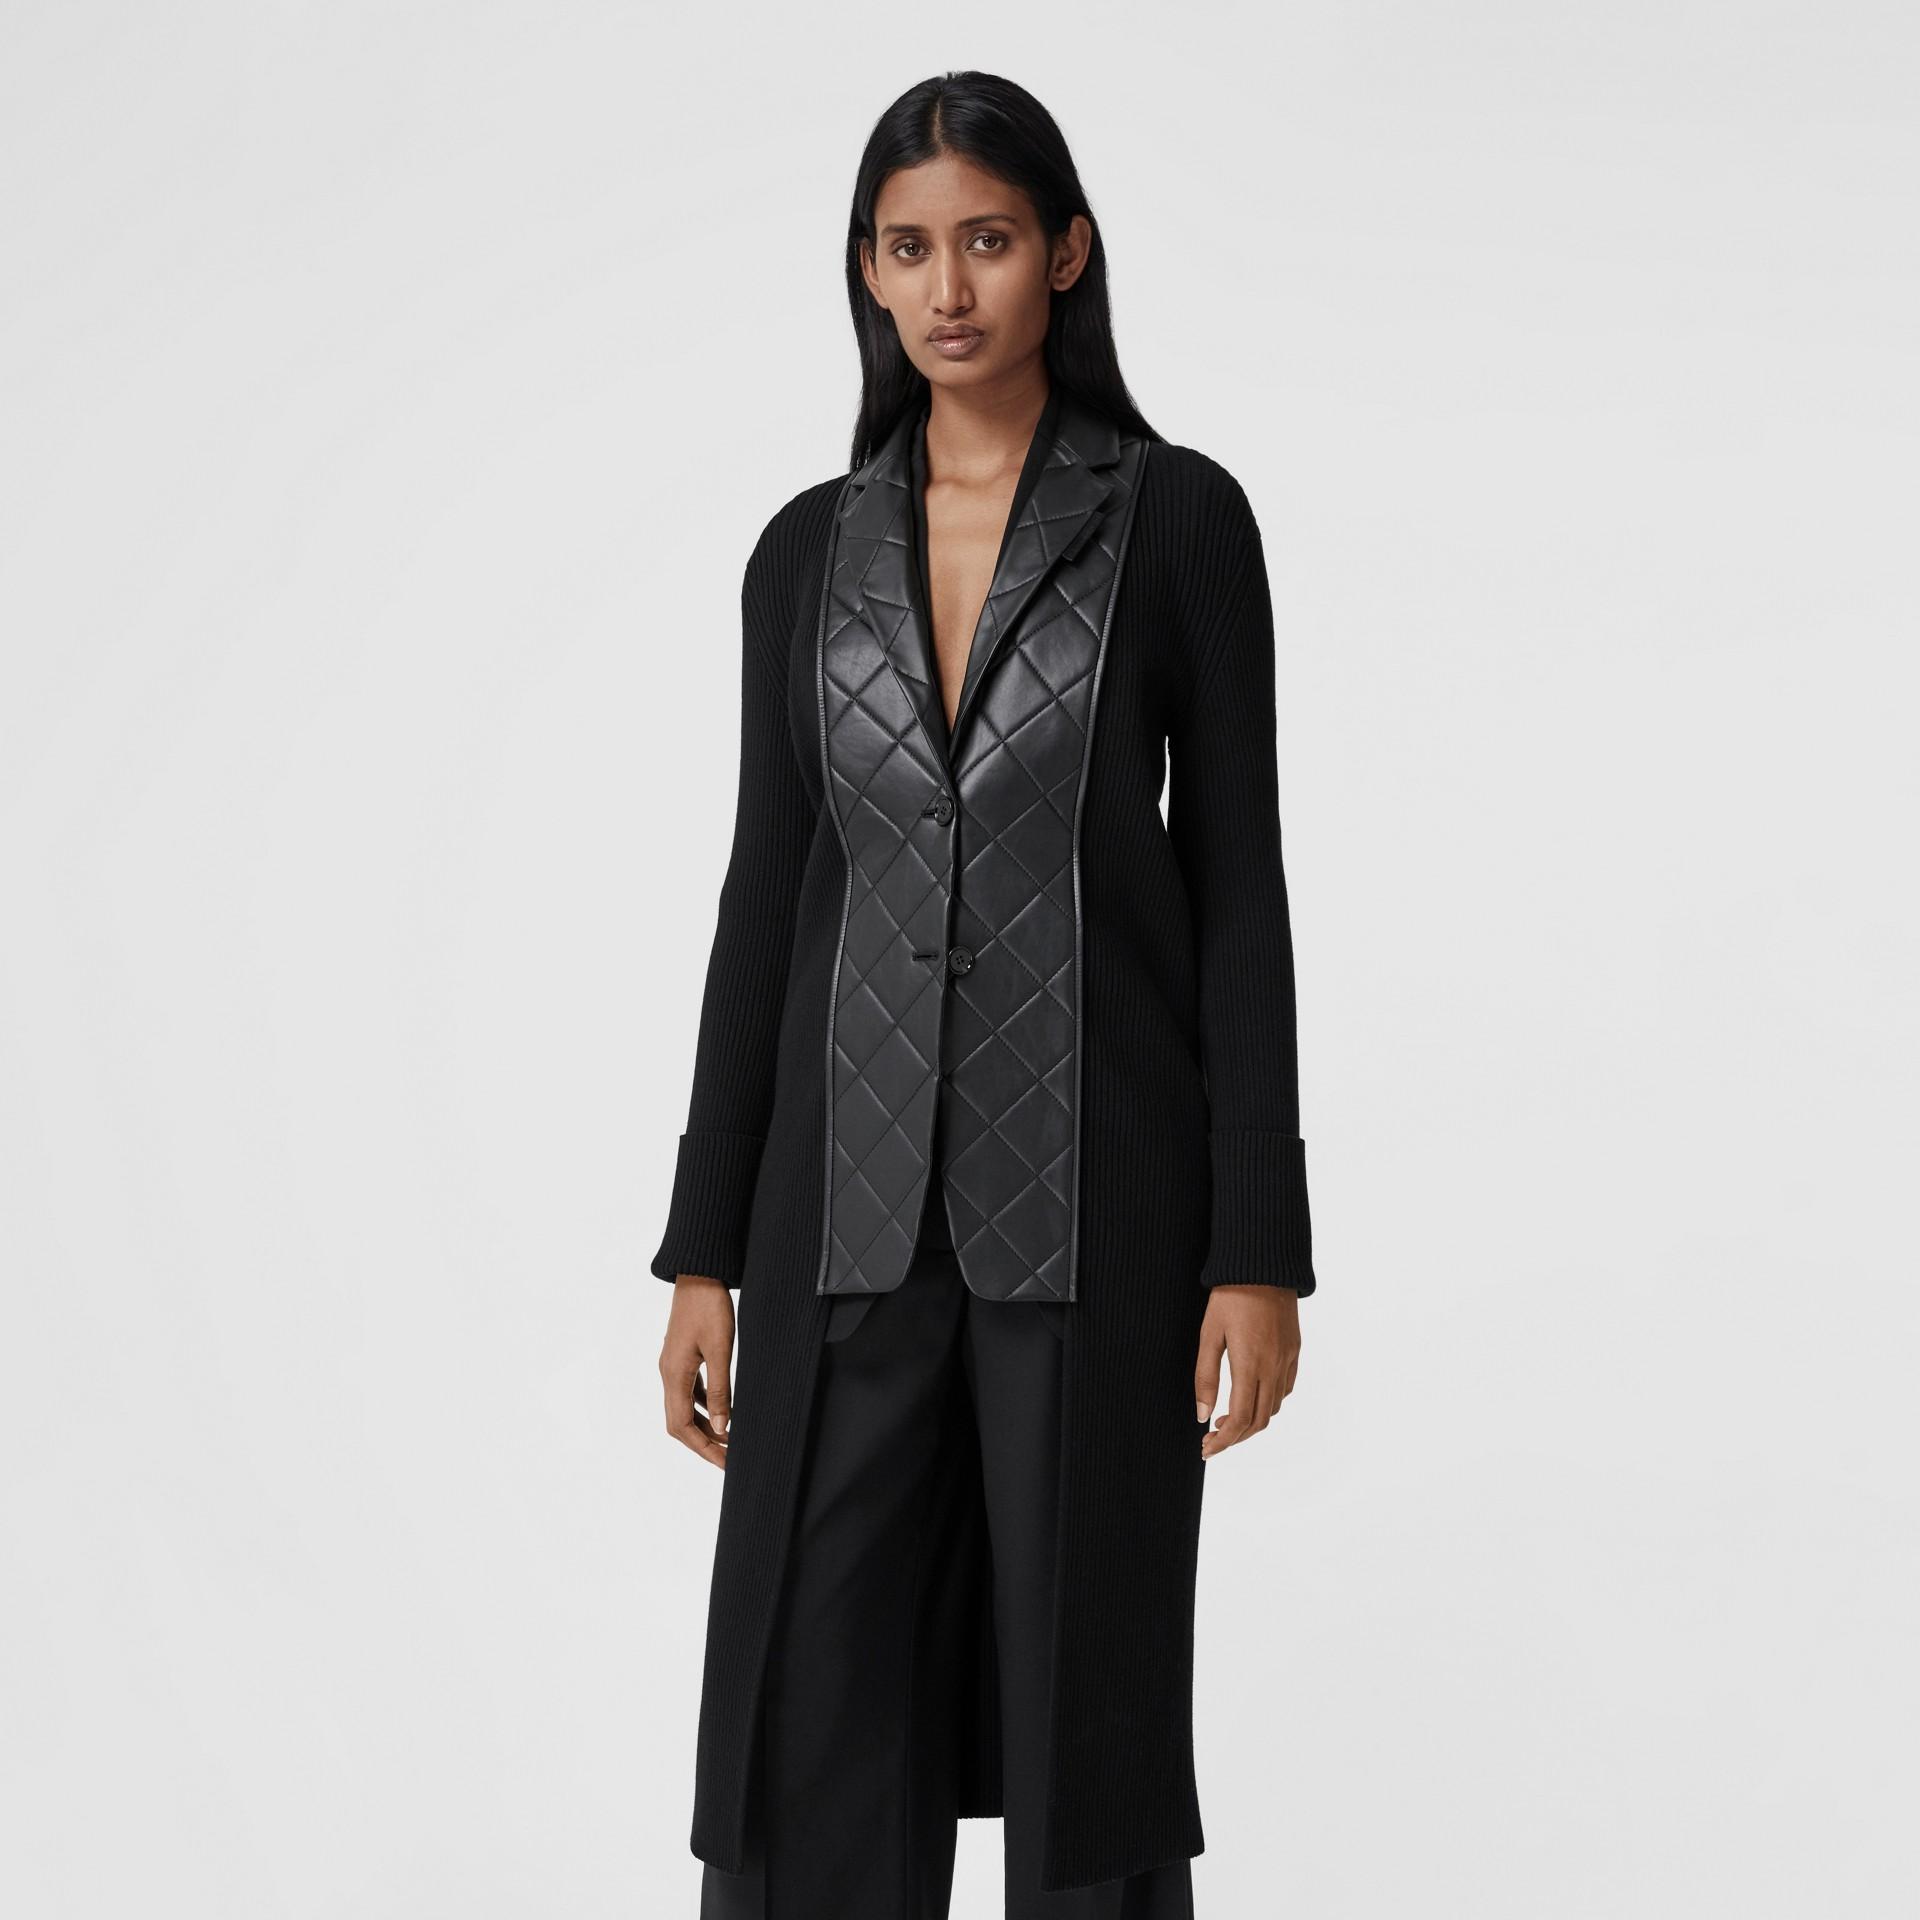 Lambskin Blazer Panel Rib Knit Wool Cardigan in Black - Women | Burberry - gallery image 4